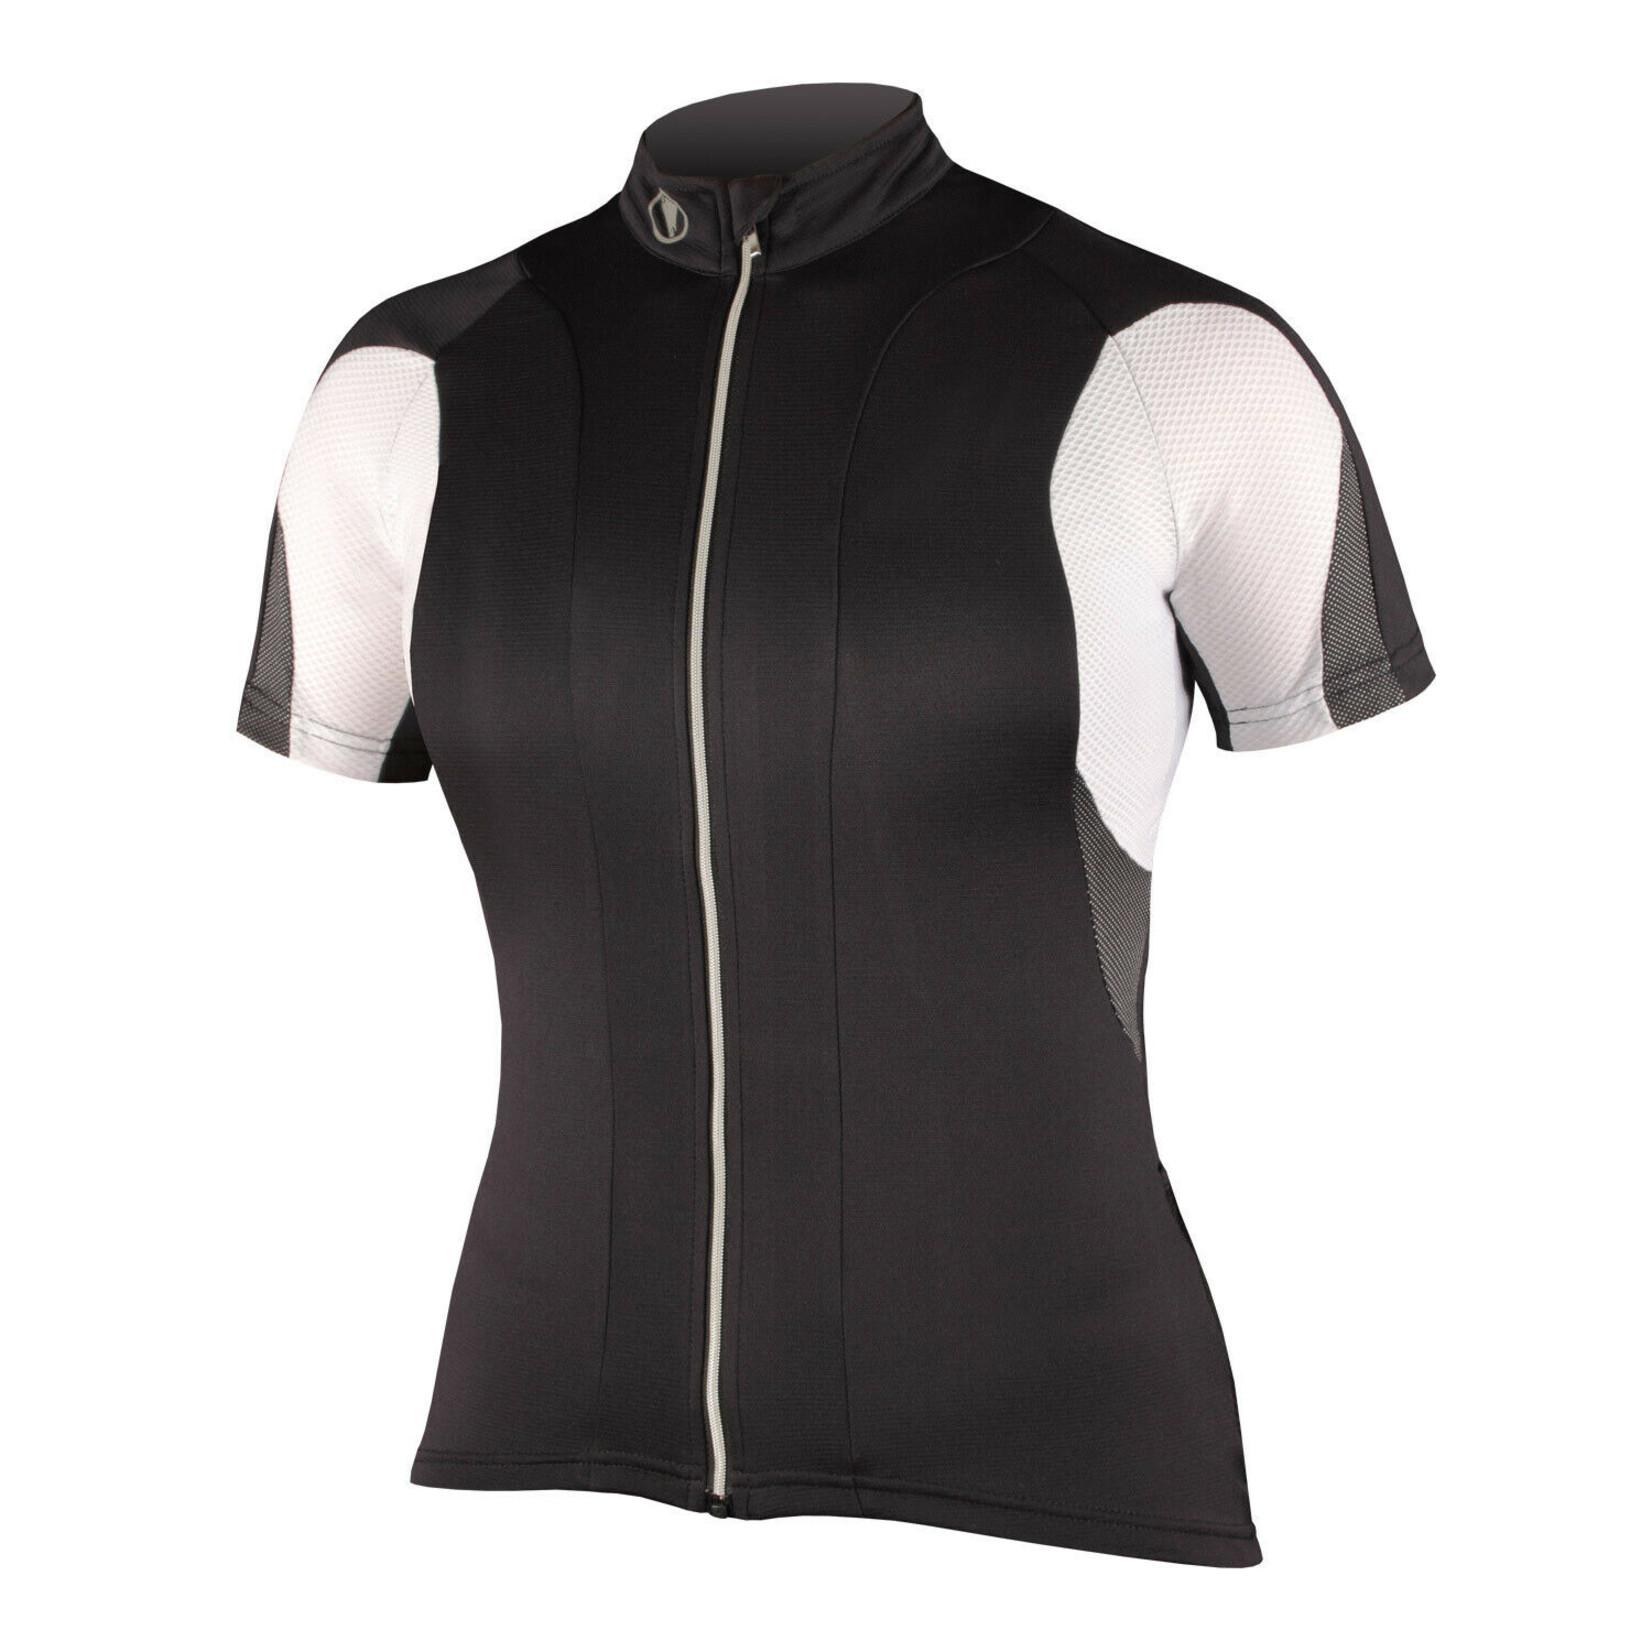 Endura Women's FS260 Pro Jersey Black S